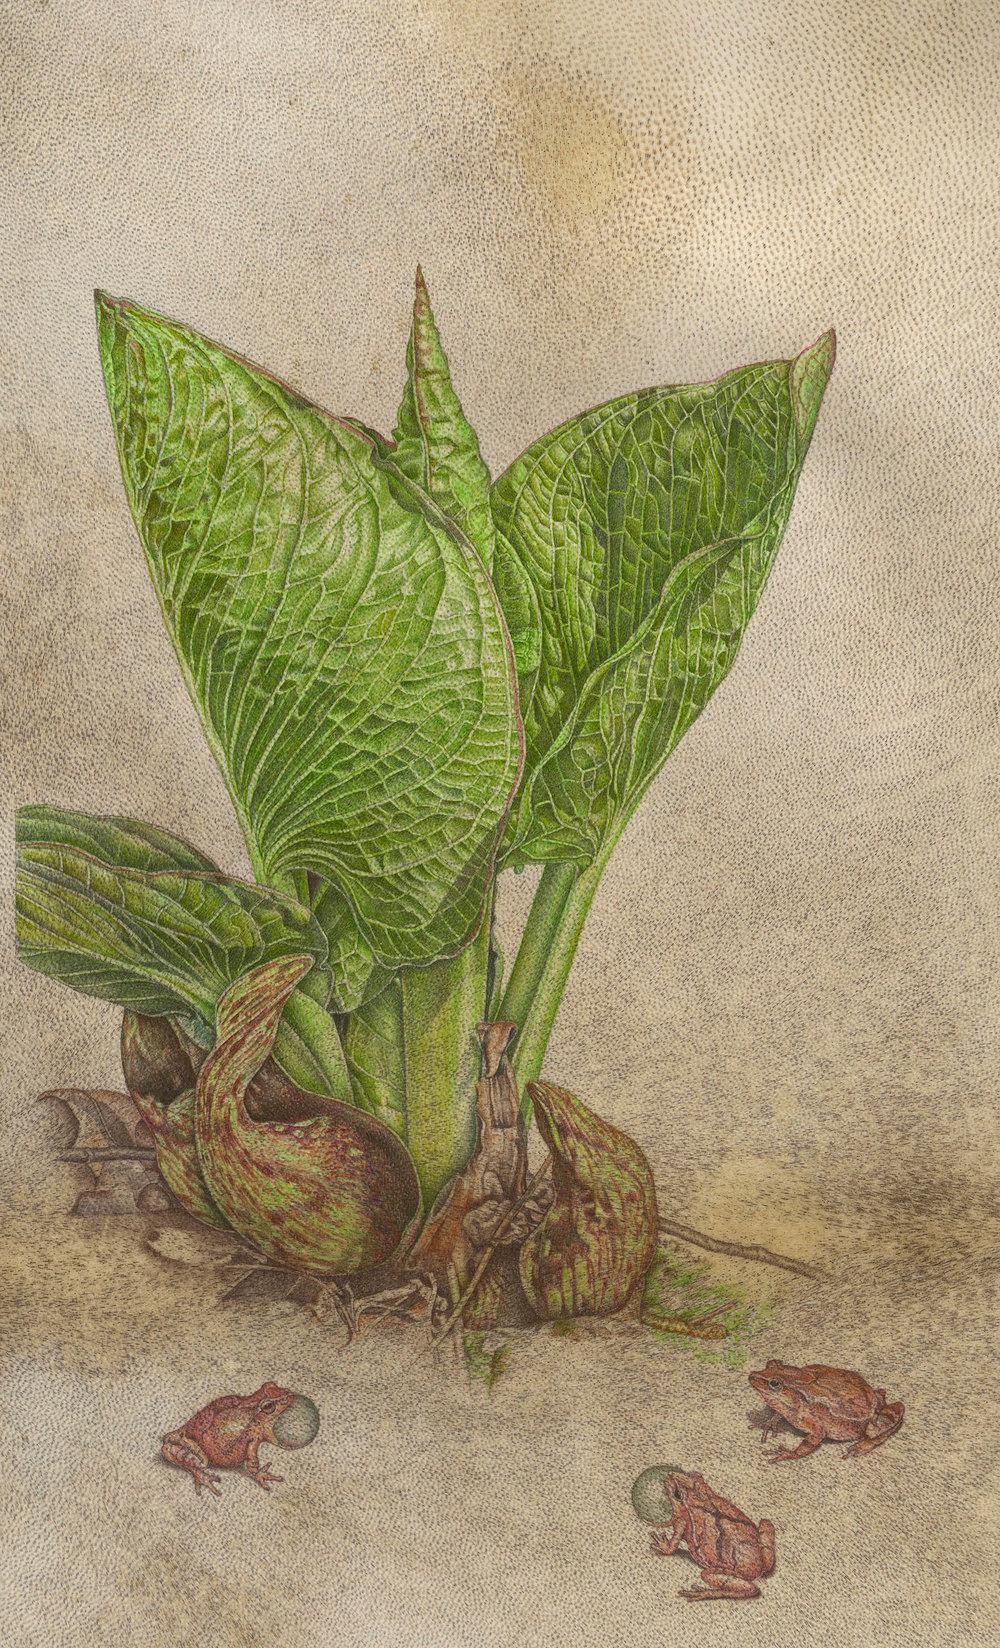 """Skunk Cabbage"", watercolor on goatskin, 16 3/4"" x 9 1/2"" (image size), $2,400 (framed)"